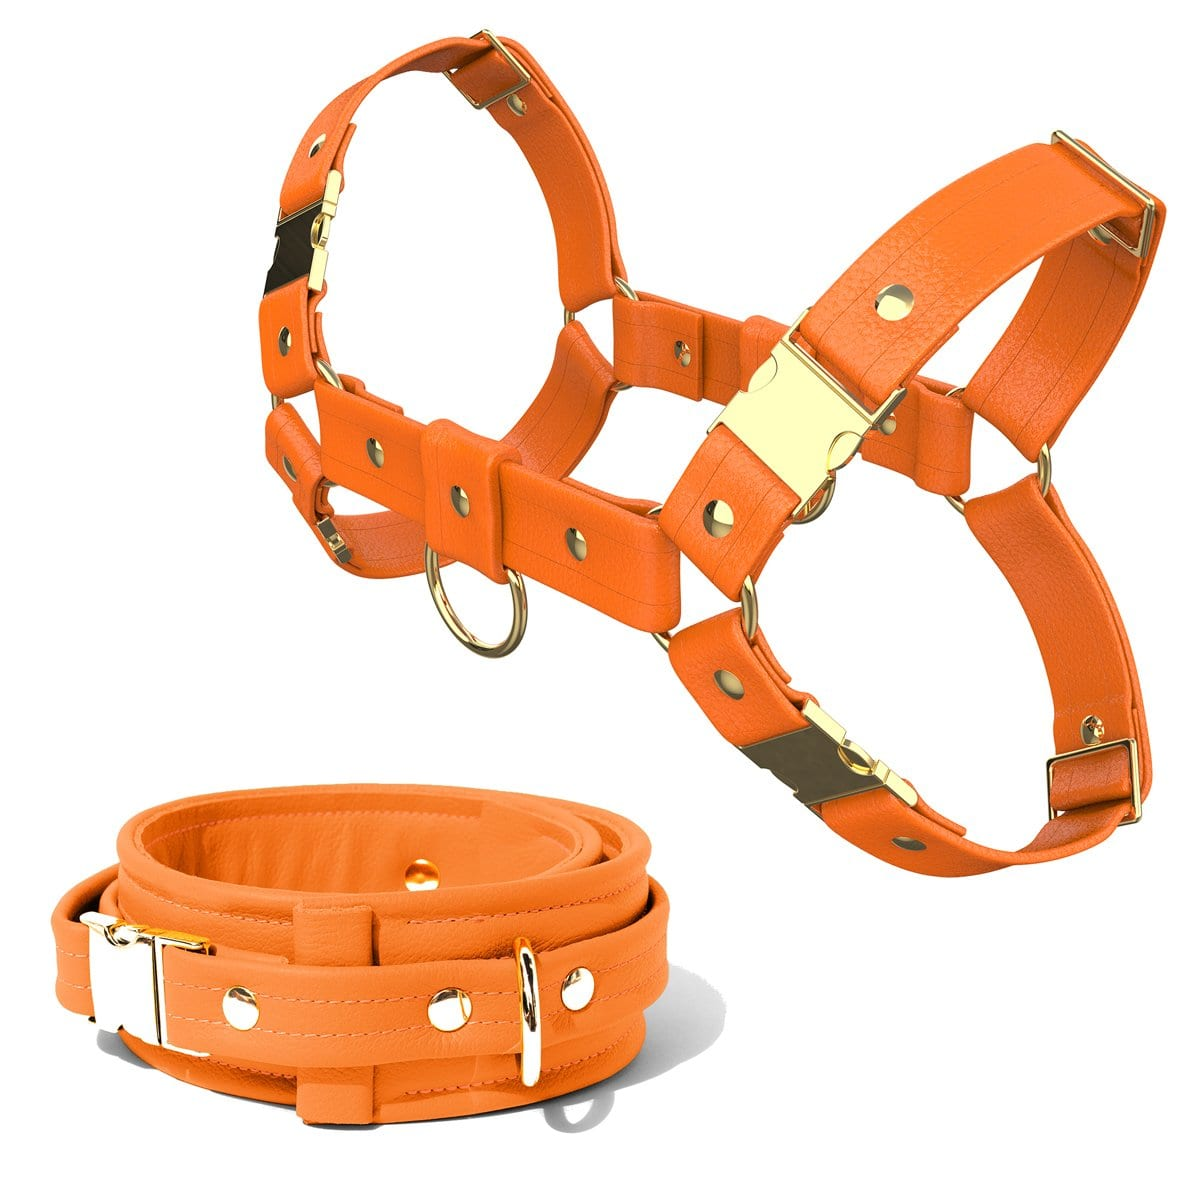 Bulldog Harness + Collar – Standard Leather – Orange - Gold Metal Fittings